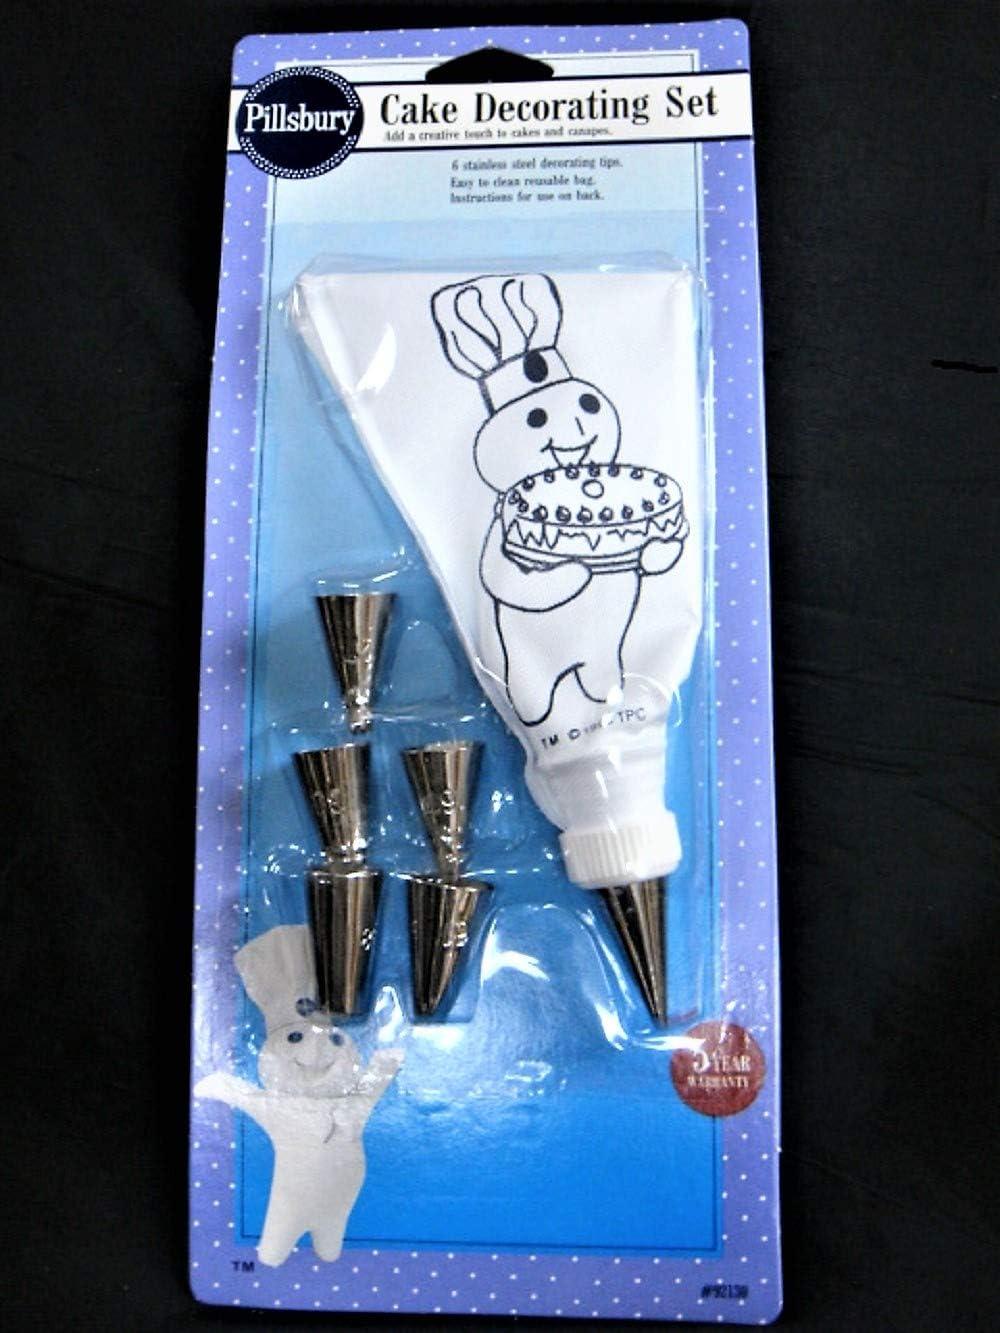 1992 Pillsbury Doughboy Cake Decorating Set-6 Stainless Tips-Easy to Clean Reusable Bag-NIP